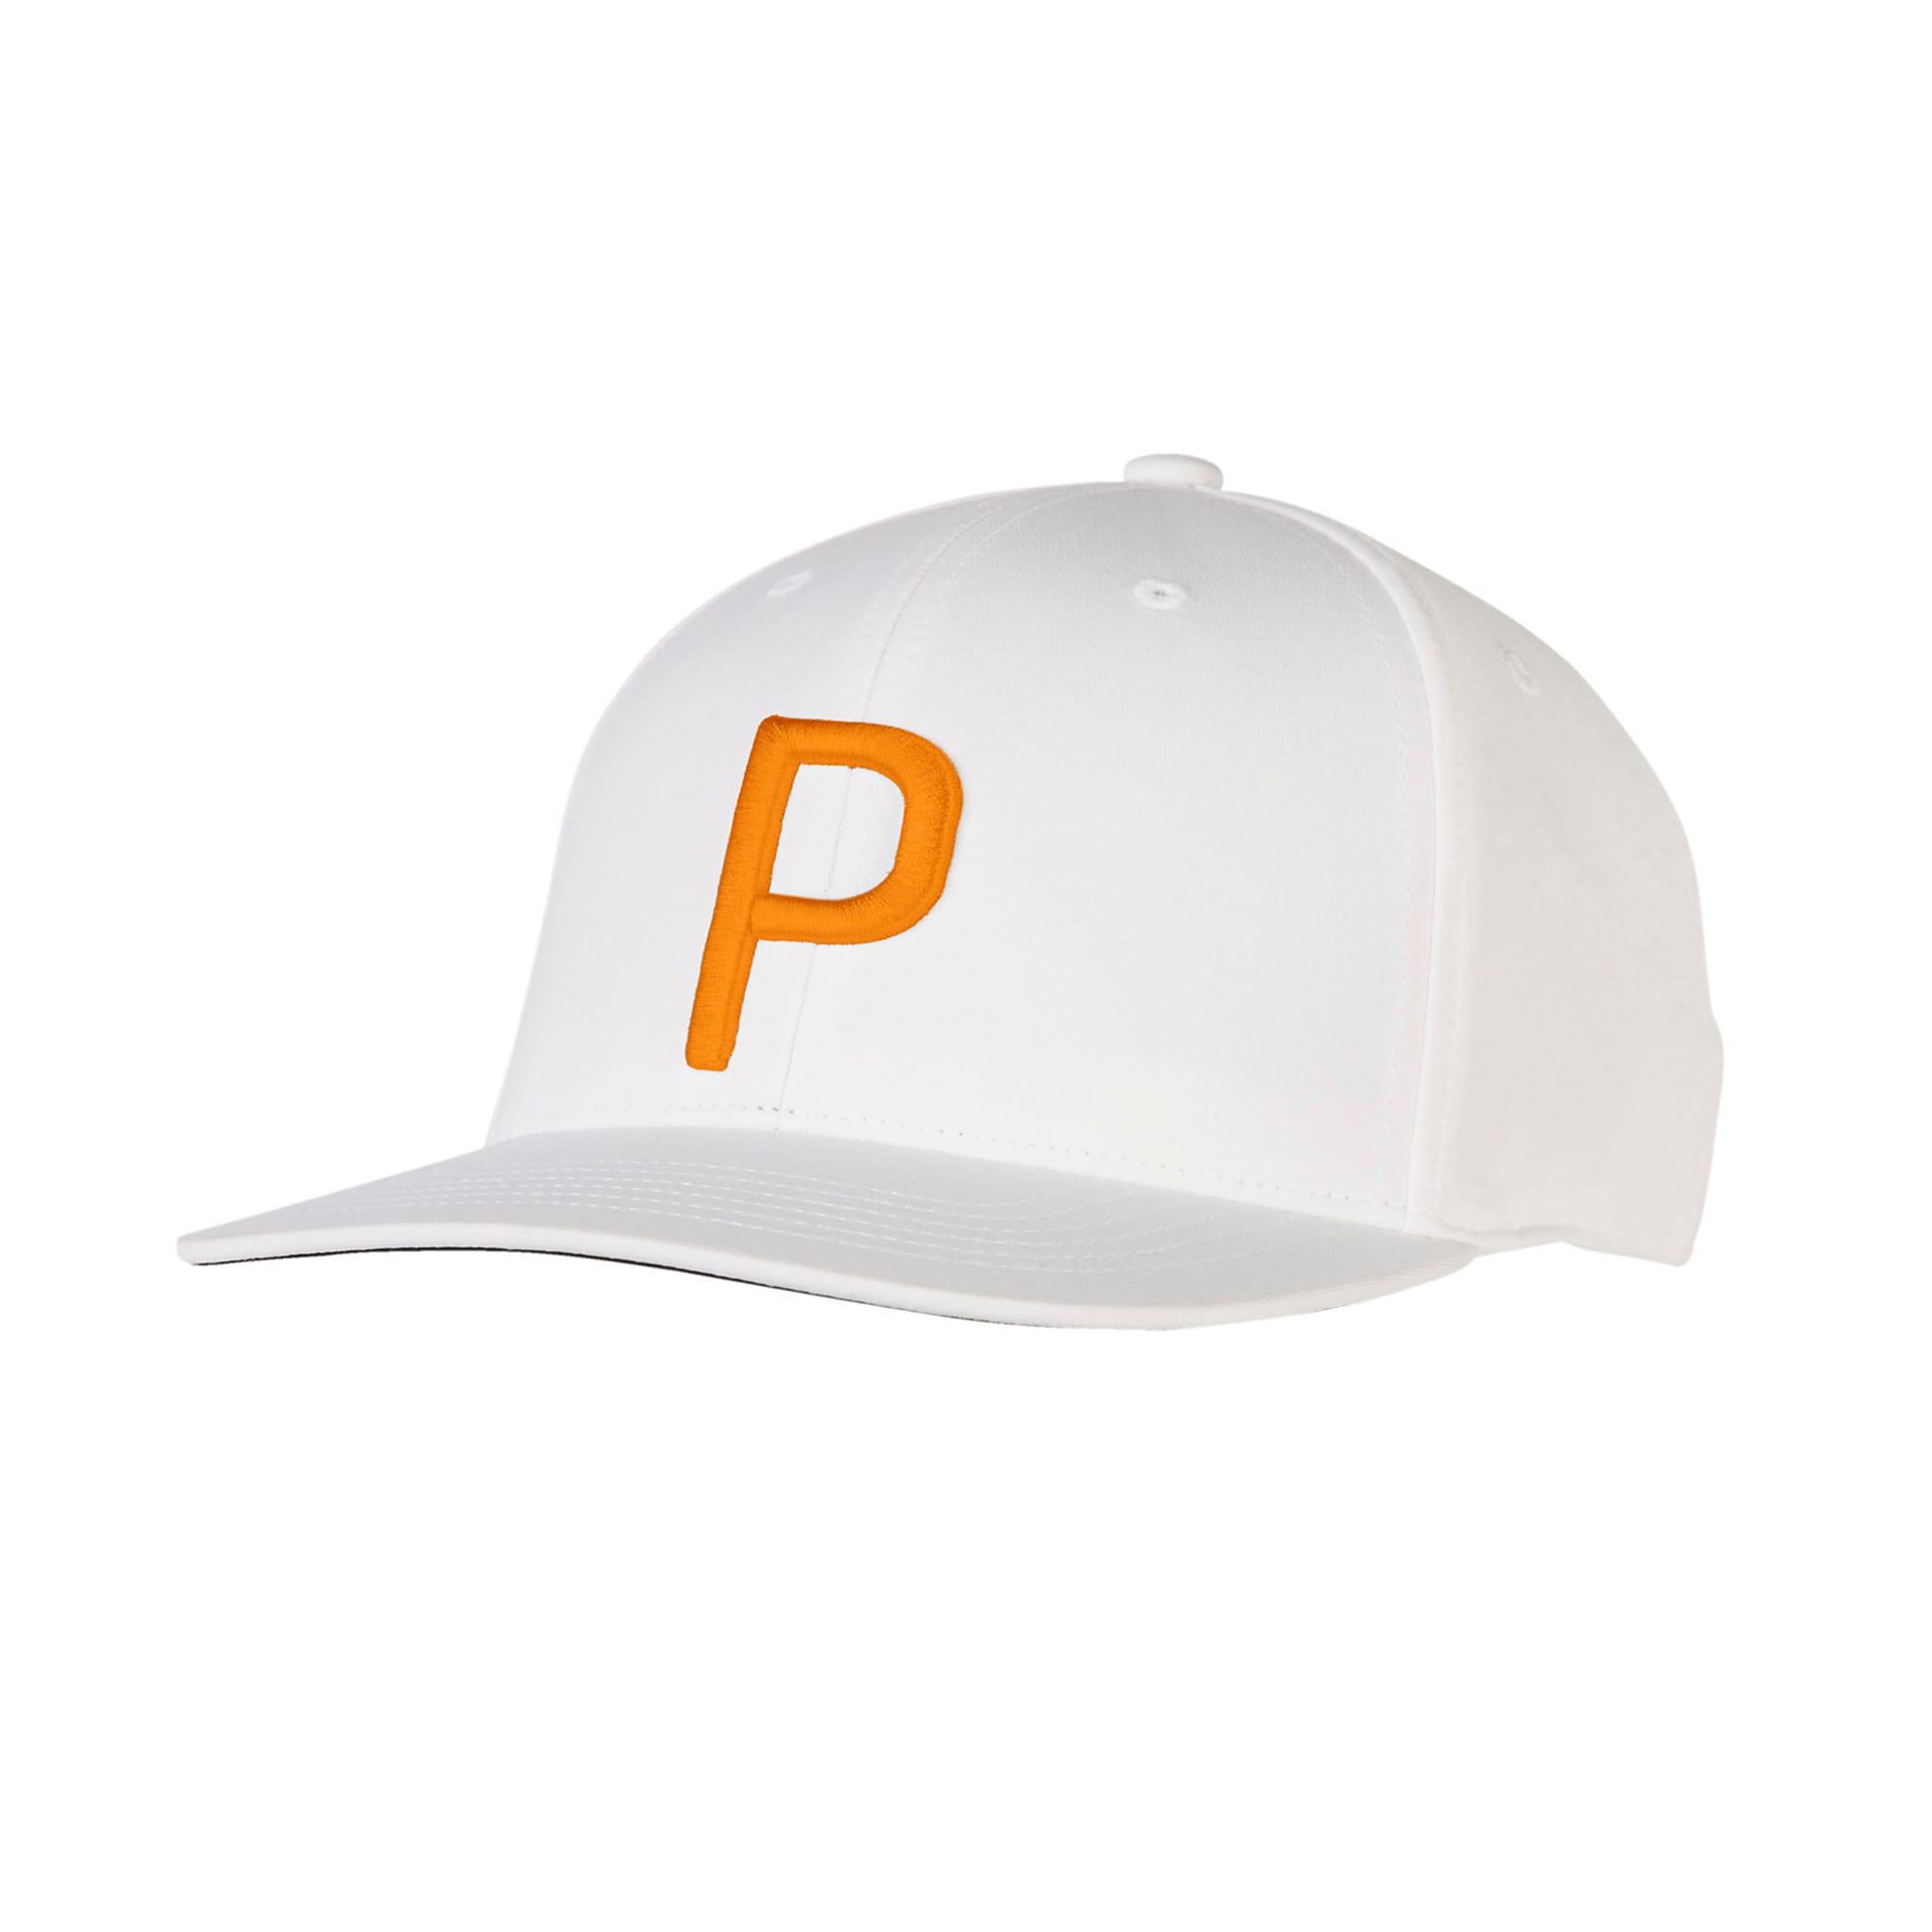 Thumbnail 1 of ゴルフ Pマークスナップバックキャップ, Bright White-Vibrant Orange, medium-JPN